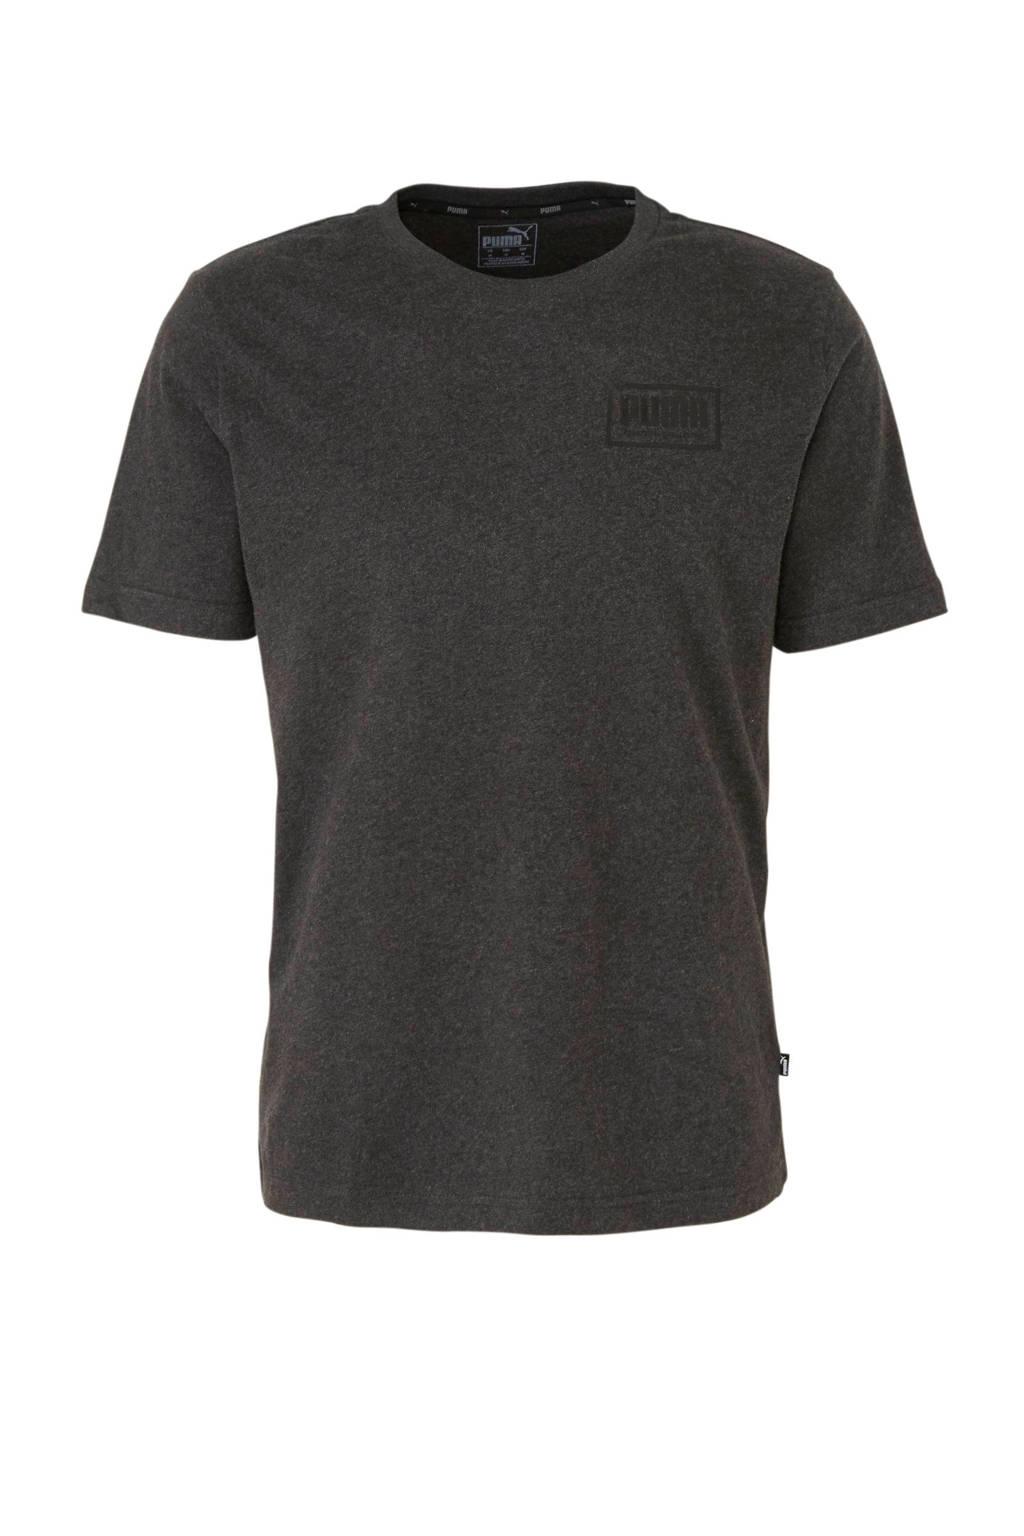 Puma   T-shirt antraciet, Antraciet